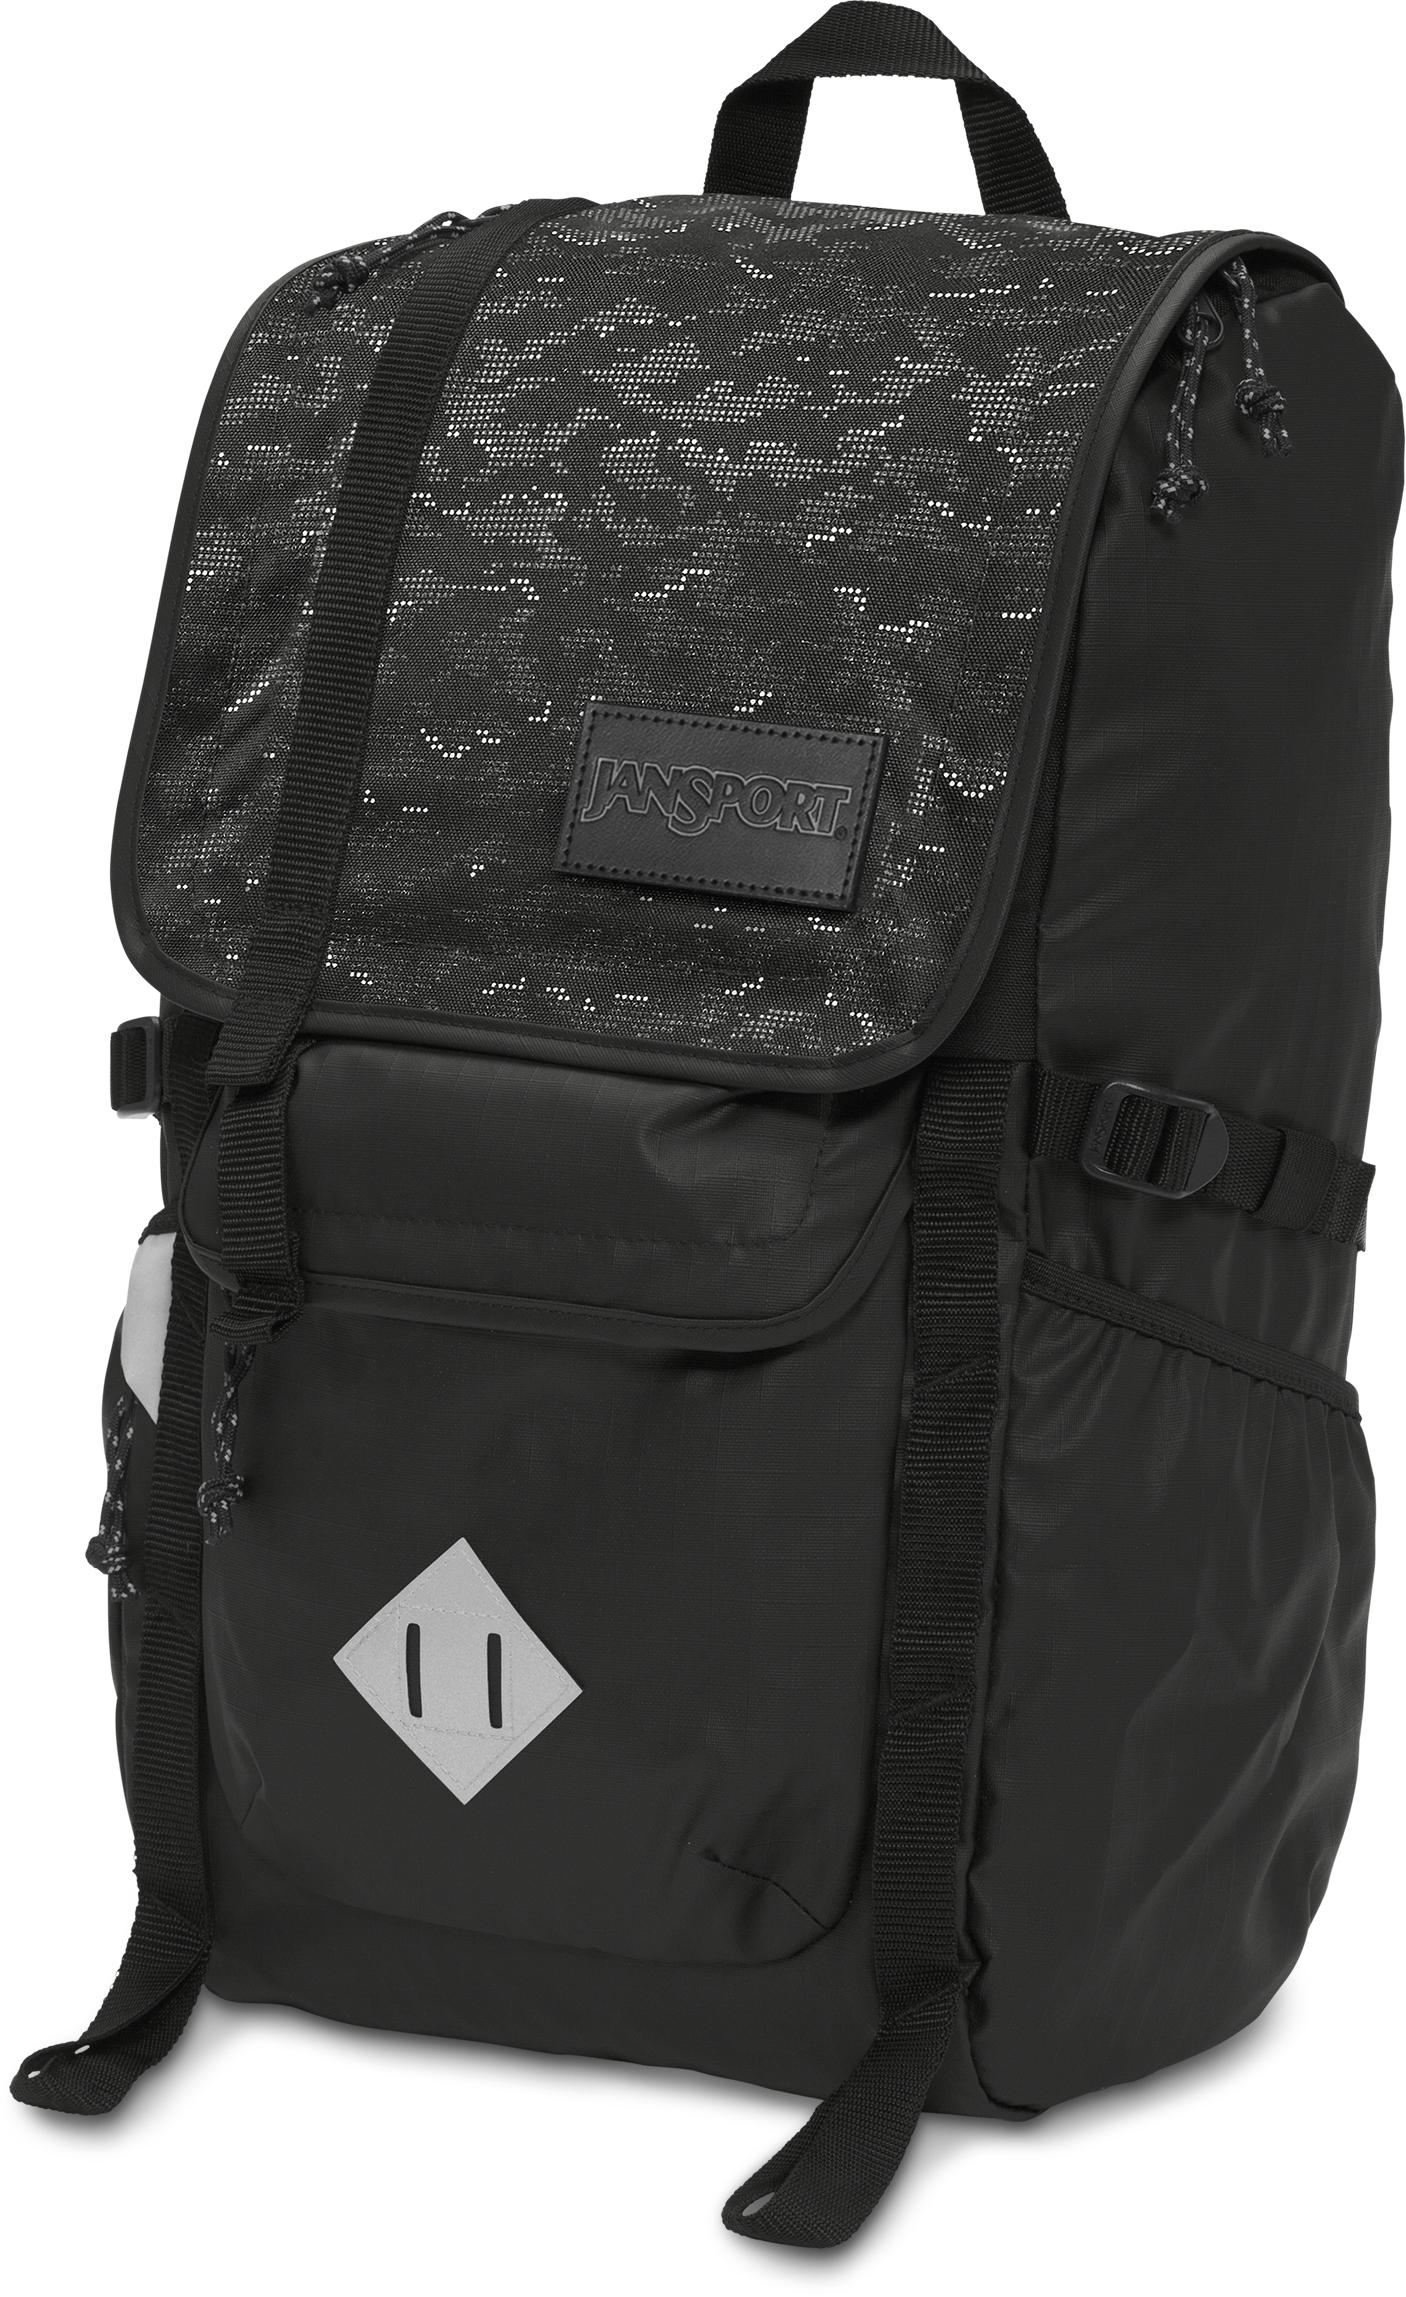 Jansport Hatchet Daypack - Unisex